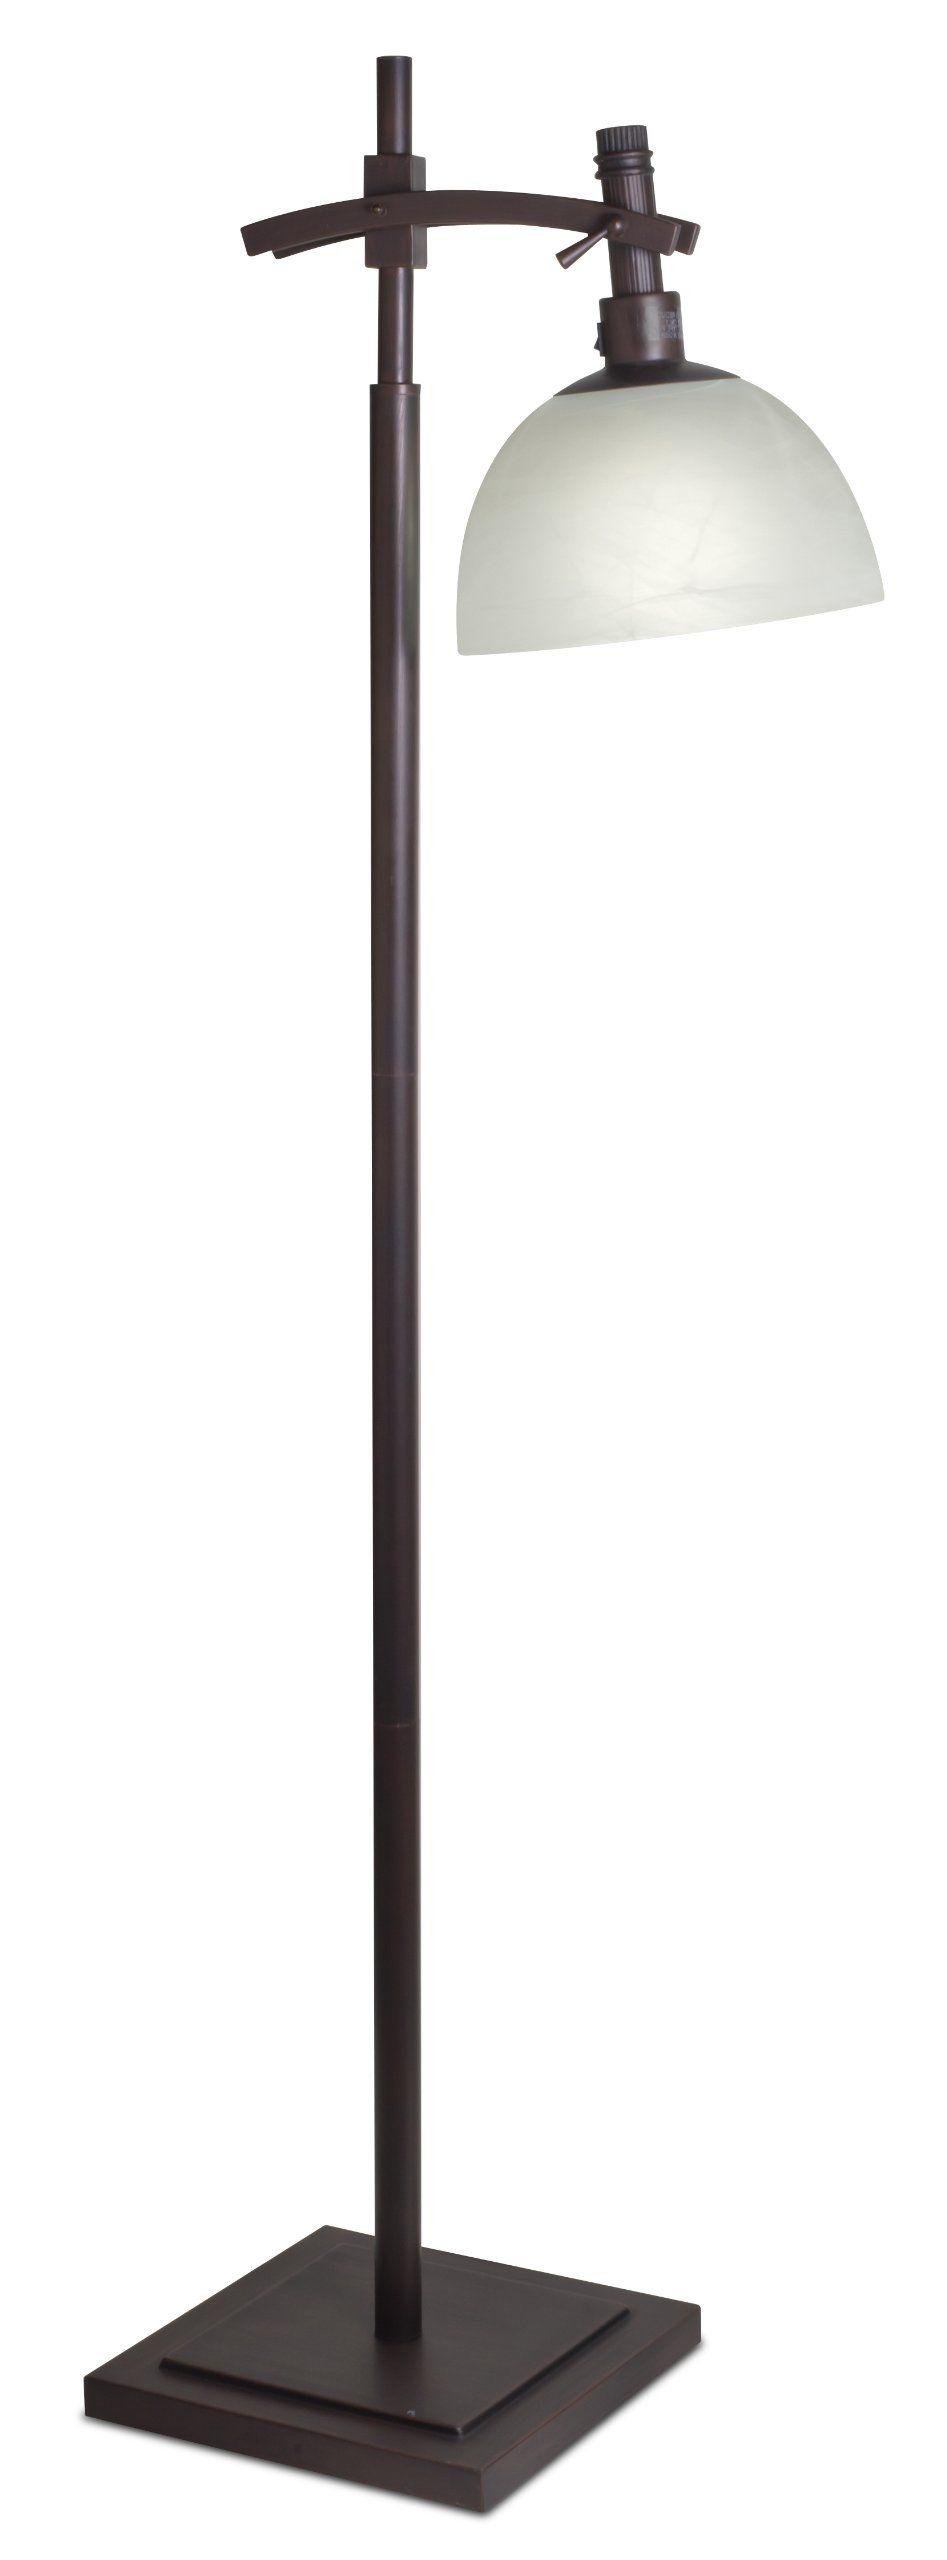 Ottlite 25591bzr 25 watt pacifica floor lamp antiqued bronze ott ottlite 25591bzr 25 watt pacifica floor lamp antiqued bronze ott light floor tyukafo